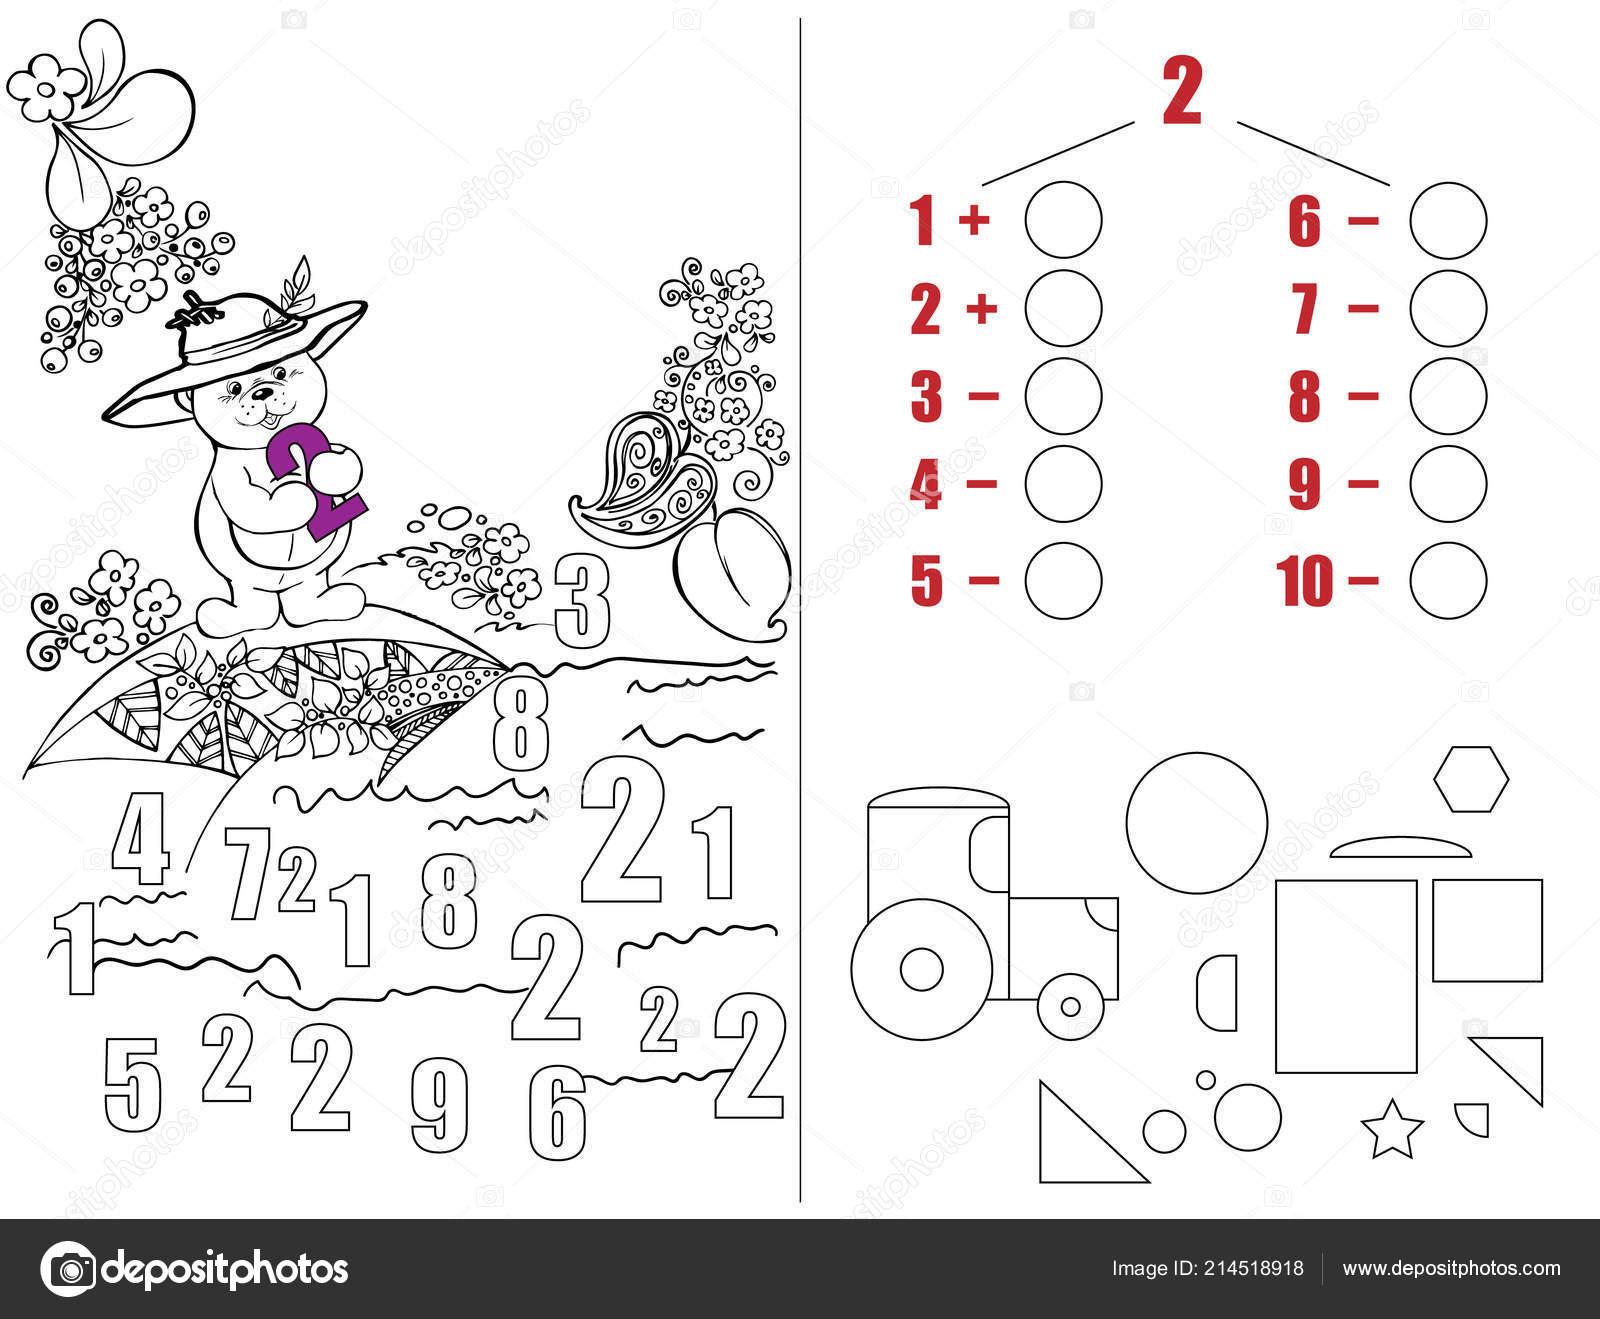 Tarea Matemáticas Rompecabezas Para Niños Matemáticas Bunny Glade